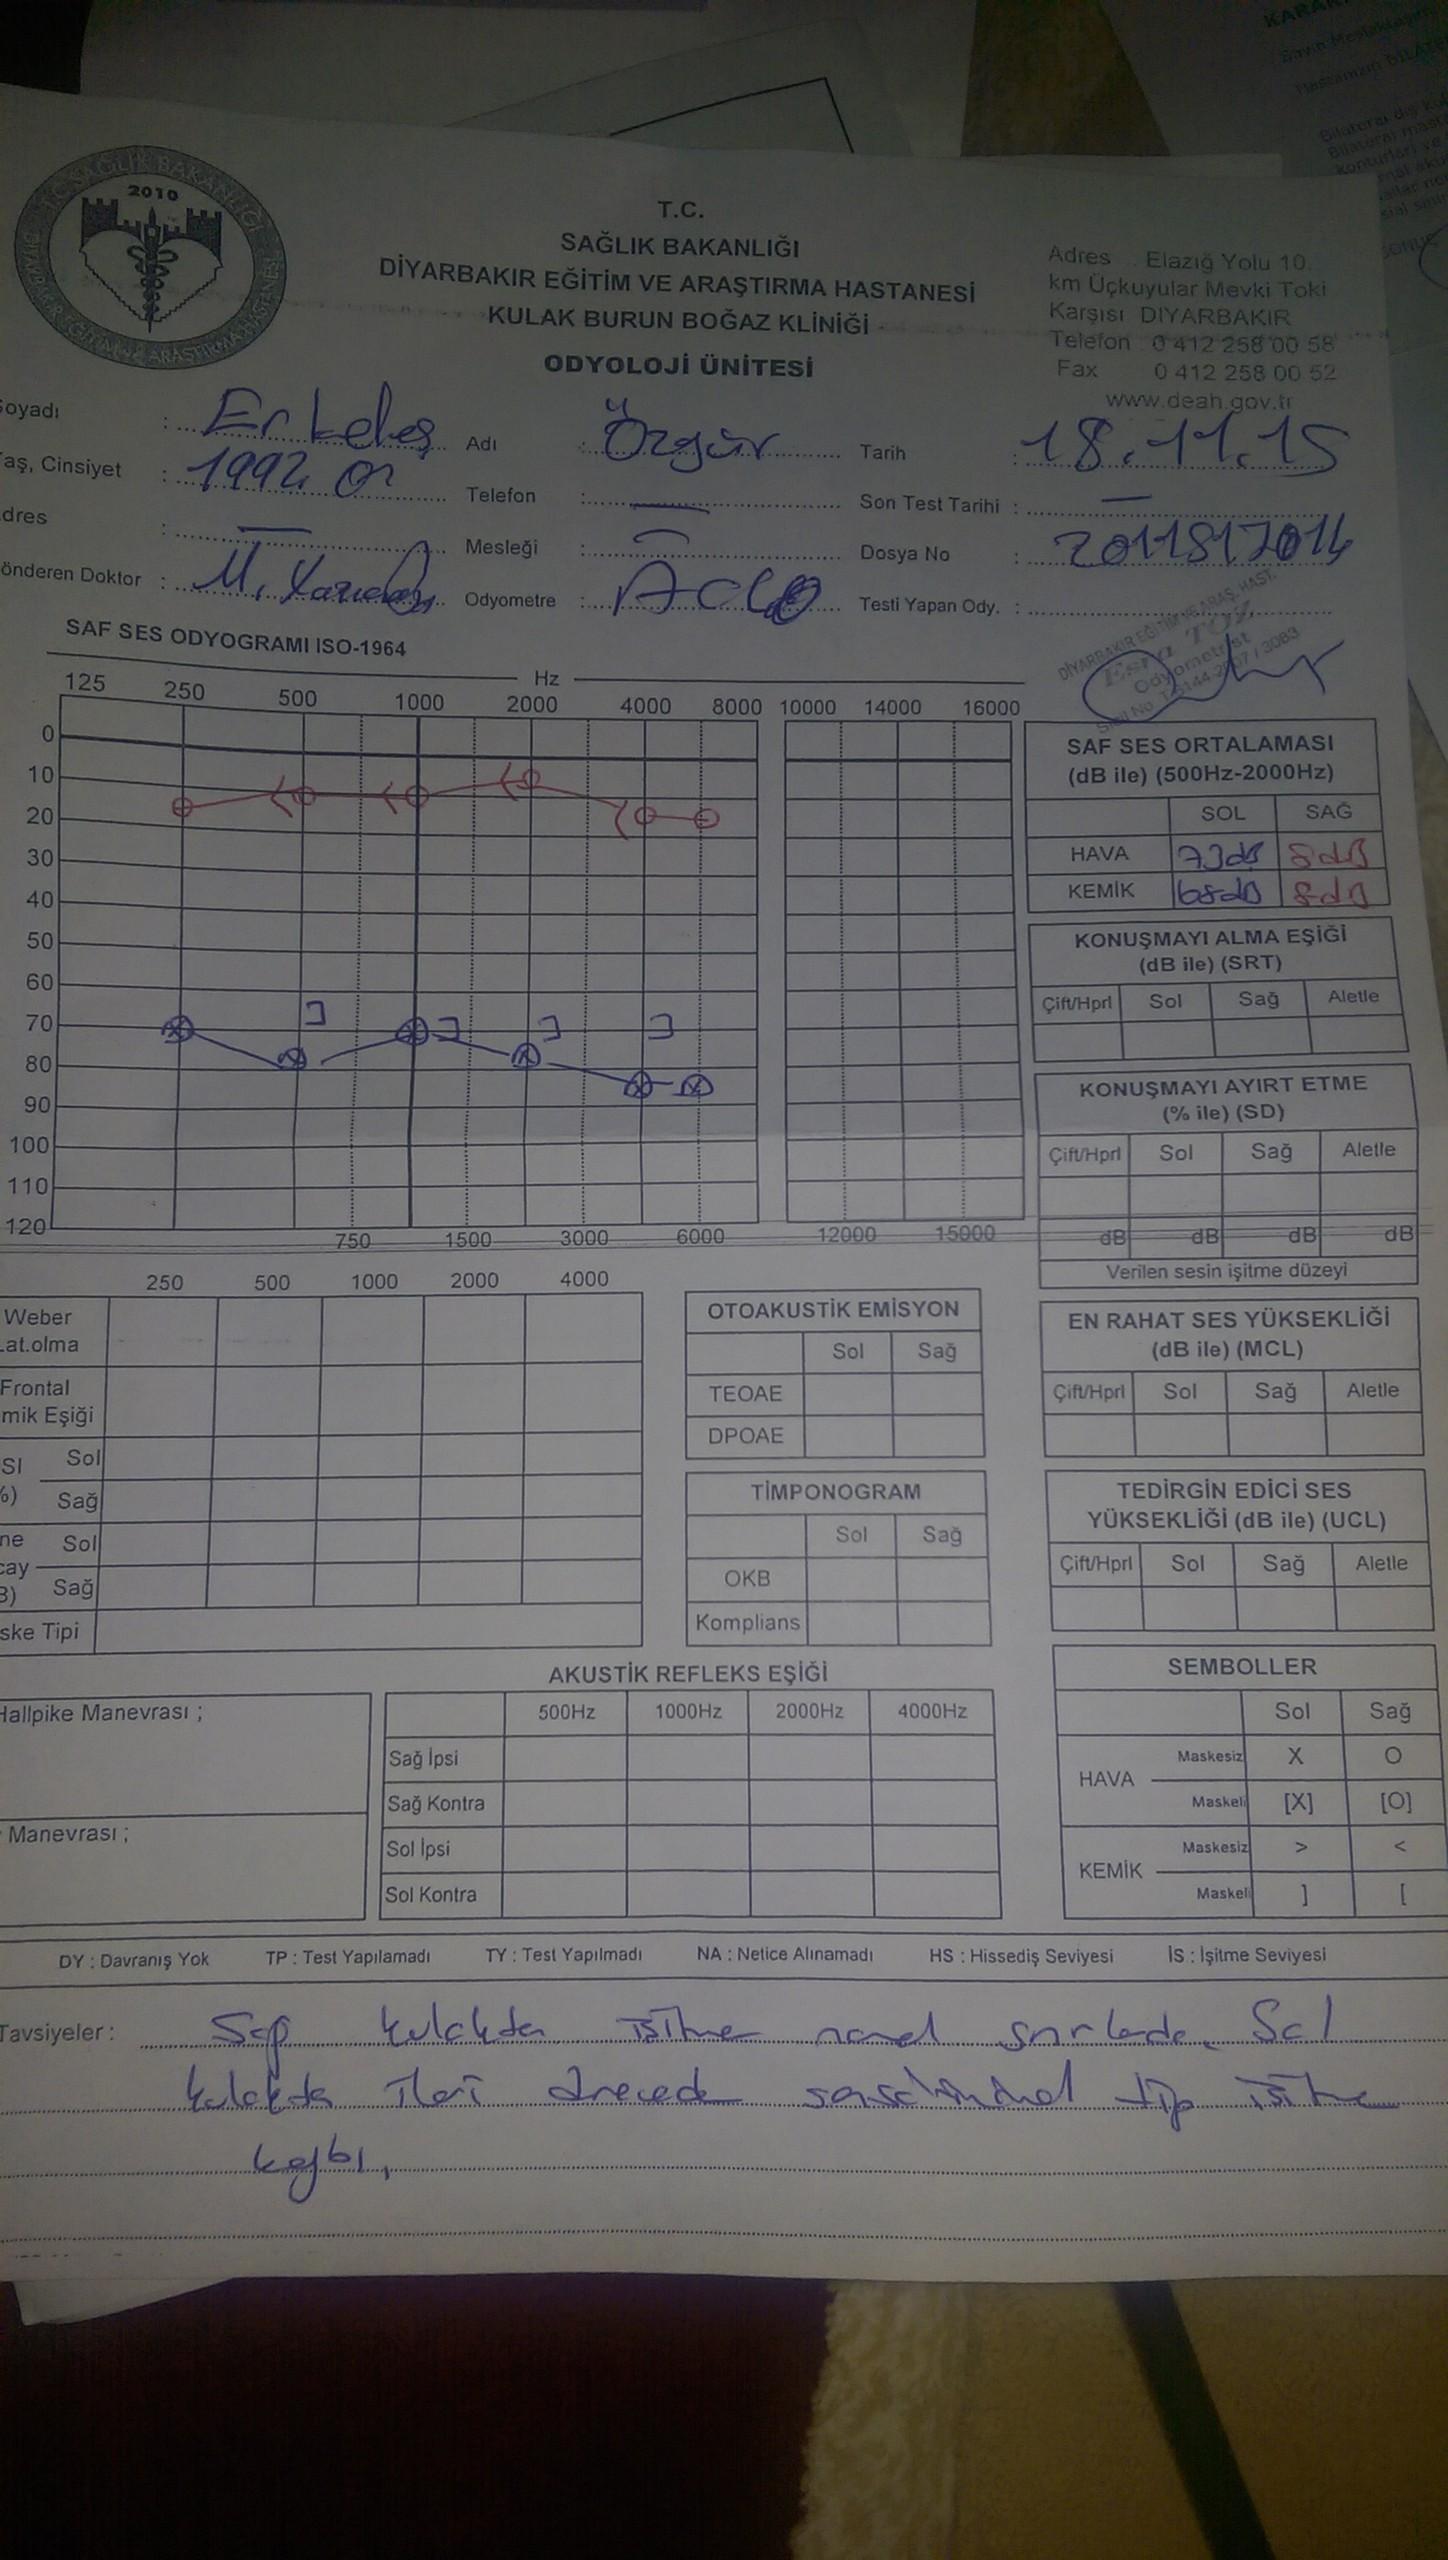 D4kRA6 - ��itme testinden �z�r oran� hesaplanmas�